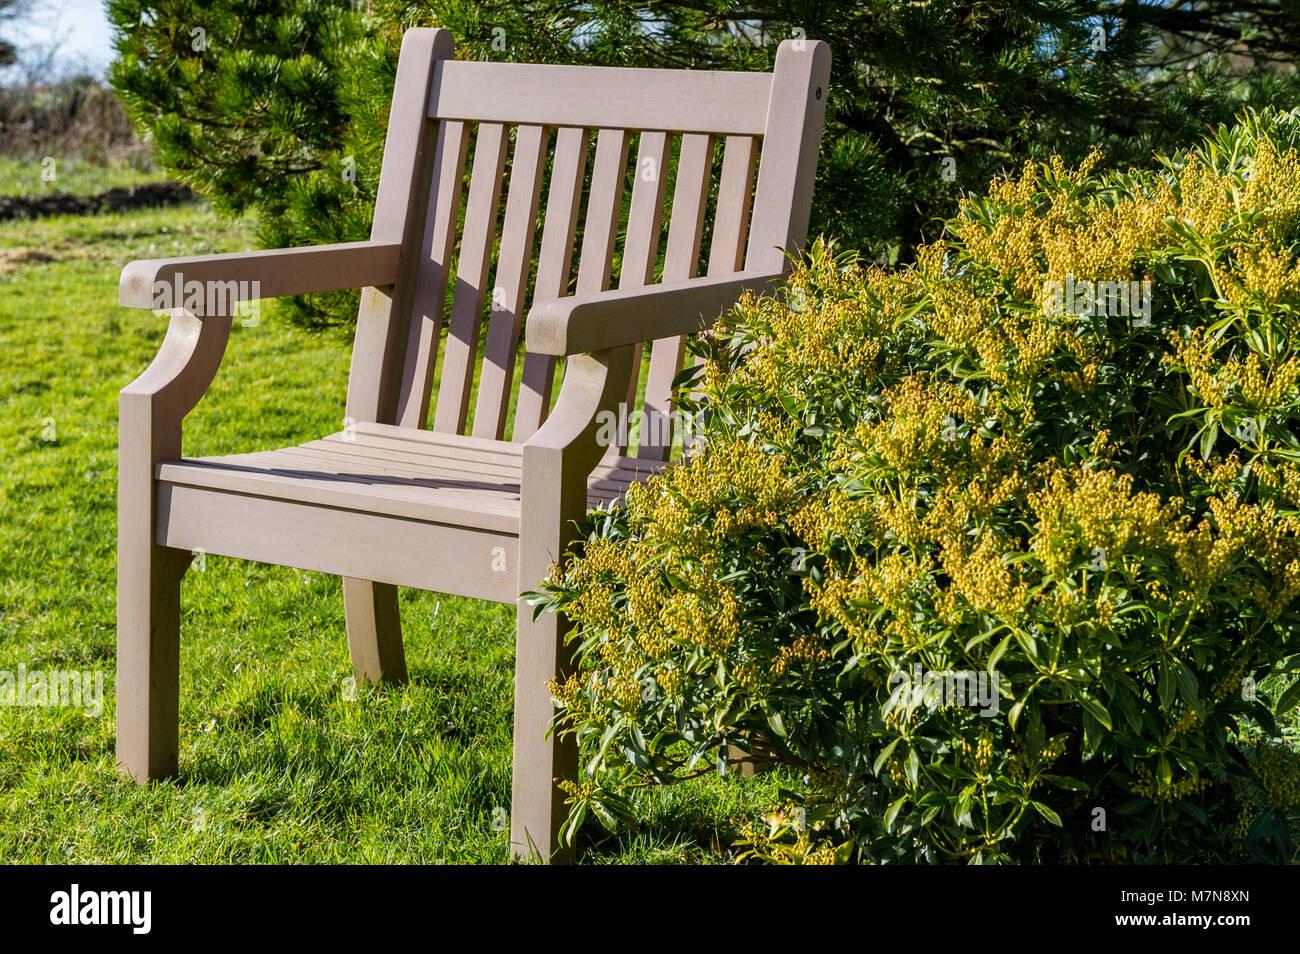 empty-wooden-chair-next-to-a-bush-in-ballydehob-west-cork-ireland-M7N8XN.jpg